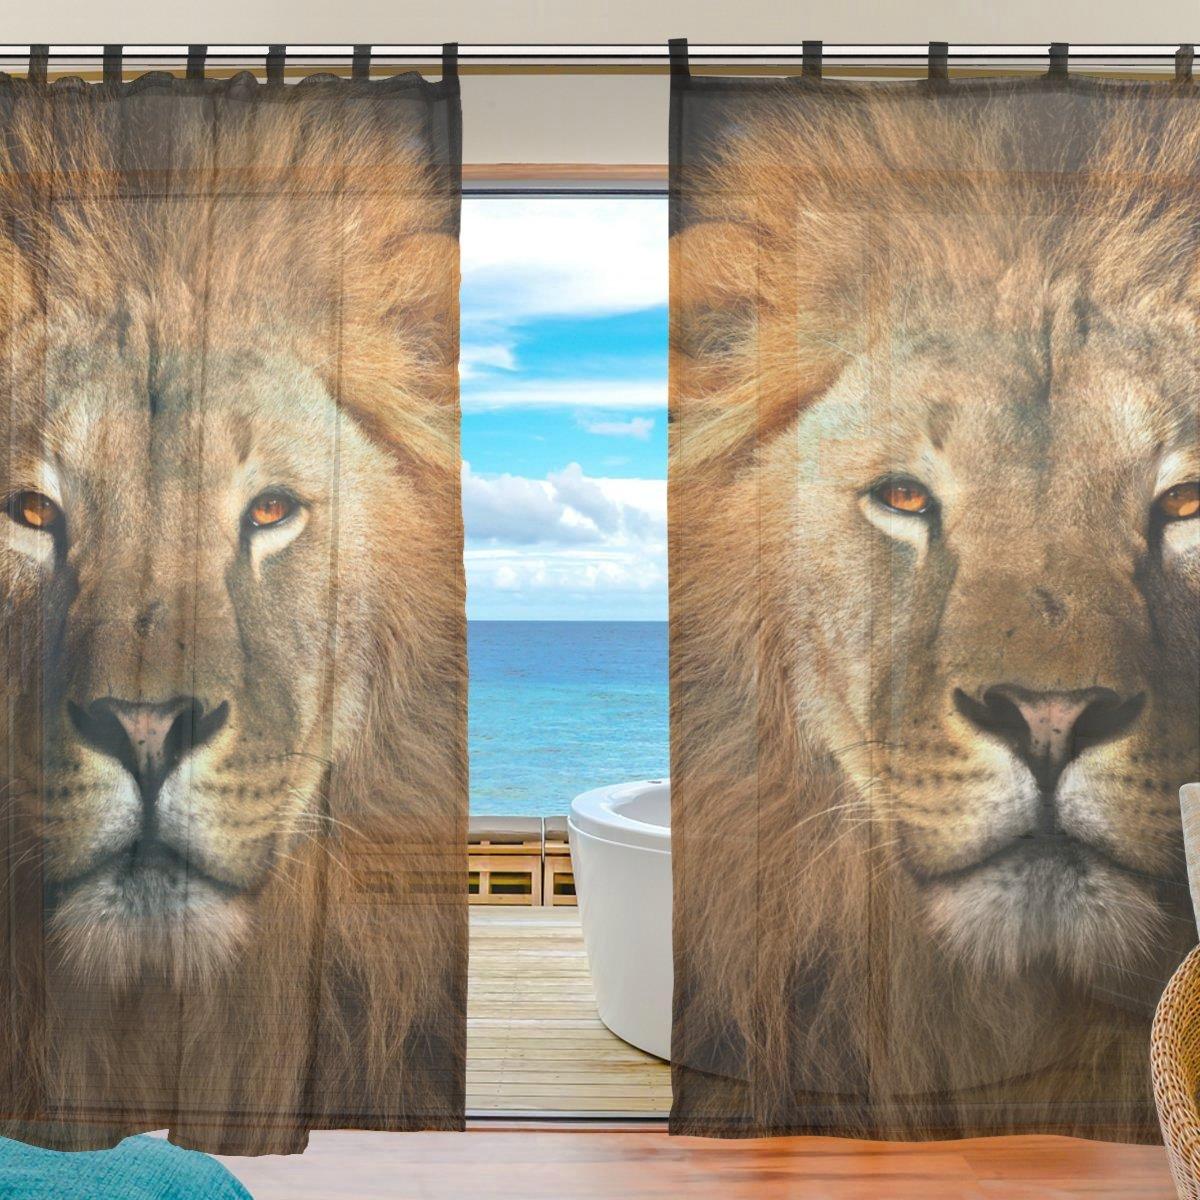 "La Random Lion King Window Sheer Voile Curtains for Living Room Bedroom Kids Room Curtains Polyester 55""Wx78""L Per Panel Set of 2 Panels"